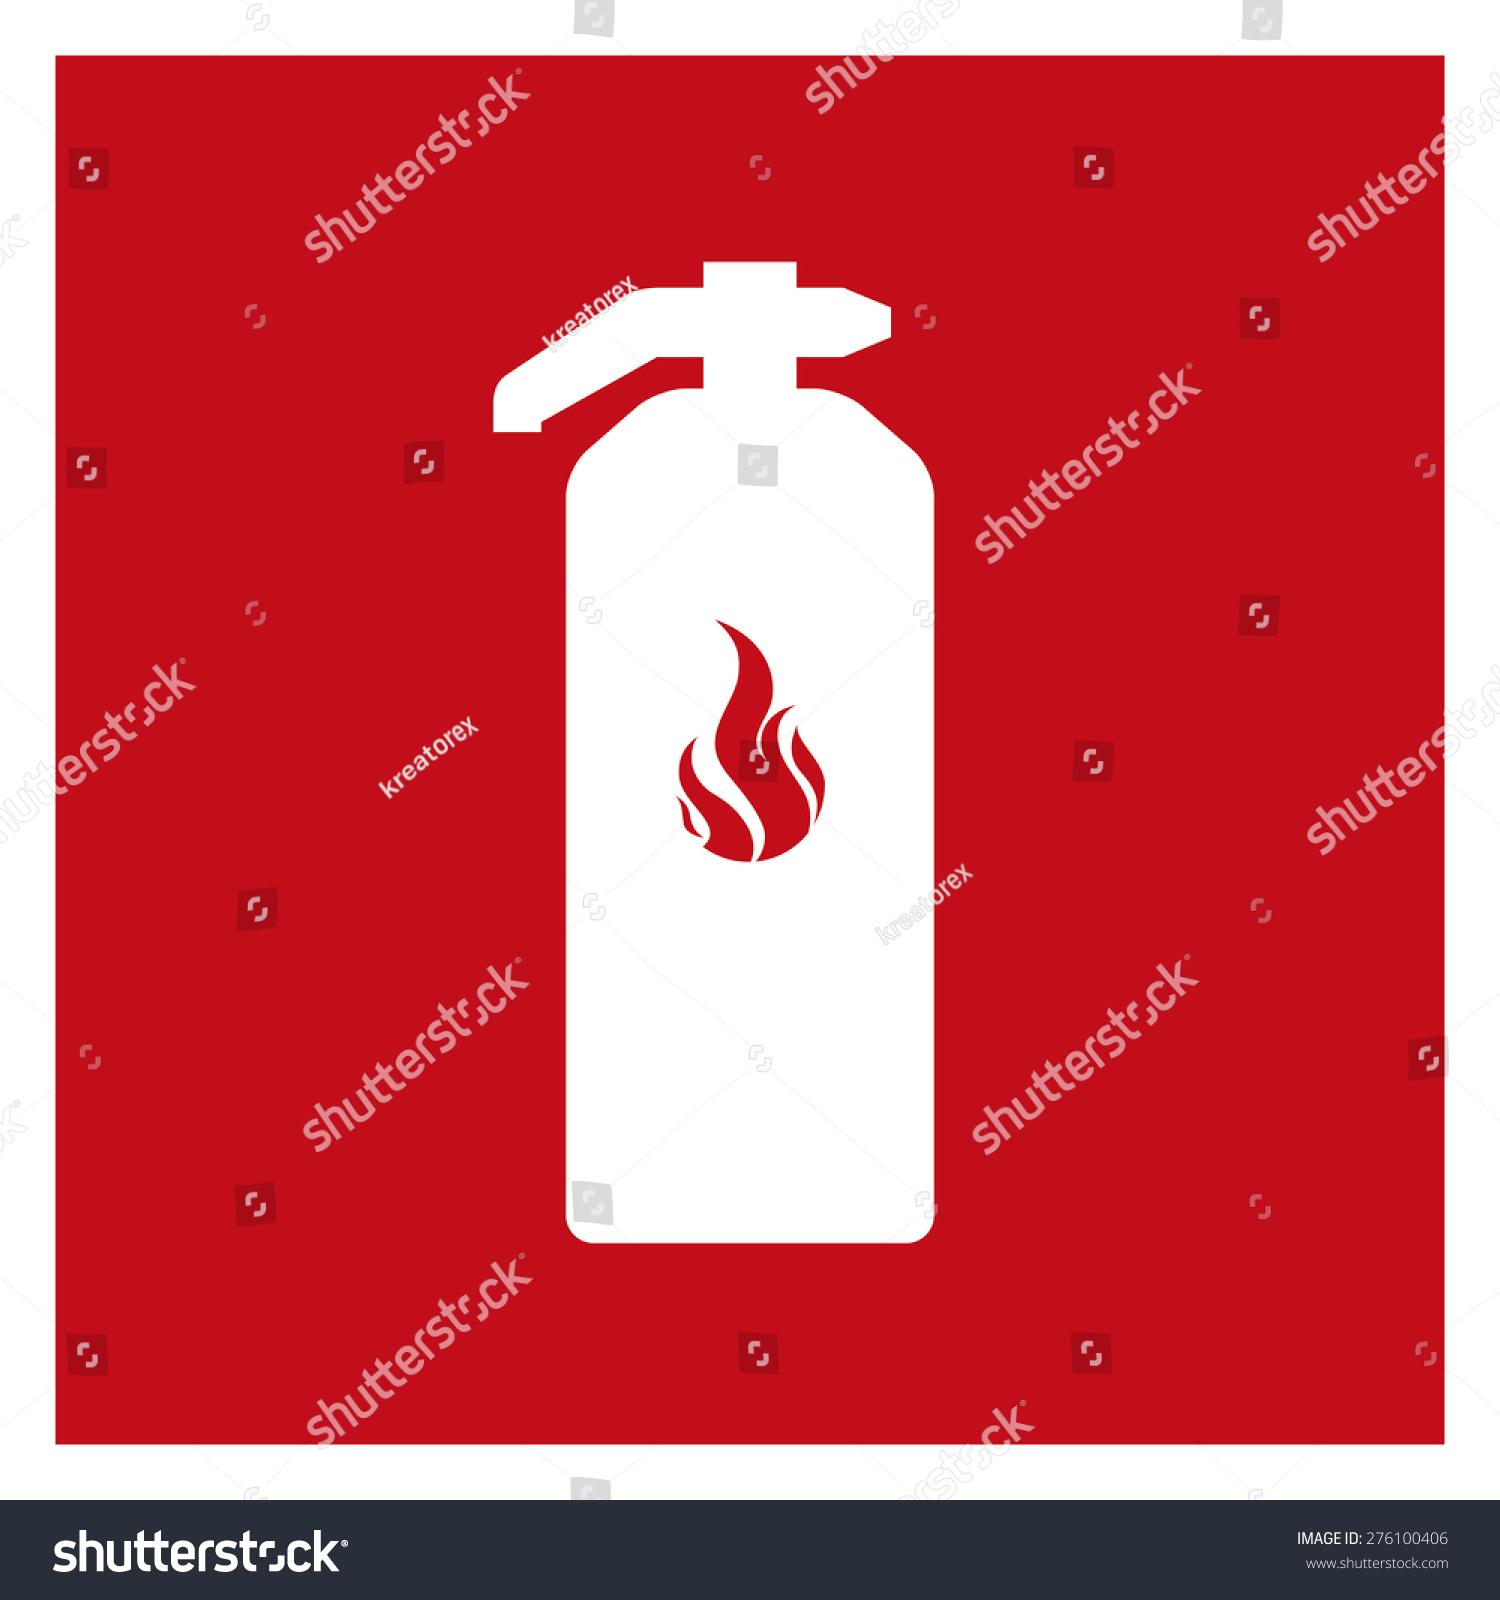 Symbol fire extinguisher gallery symbol and sign ideas symbol fire extinguisher on red background stock vector 276100406 symbol fire extinguisher on a red background buycottarizona